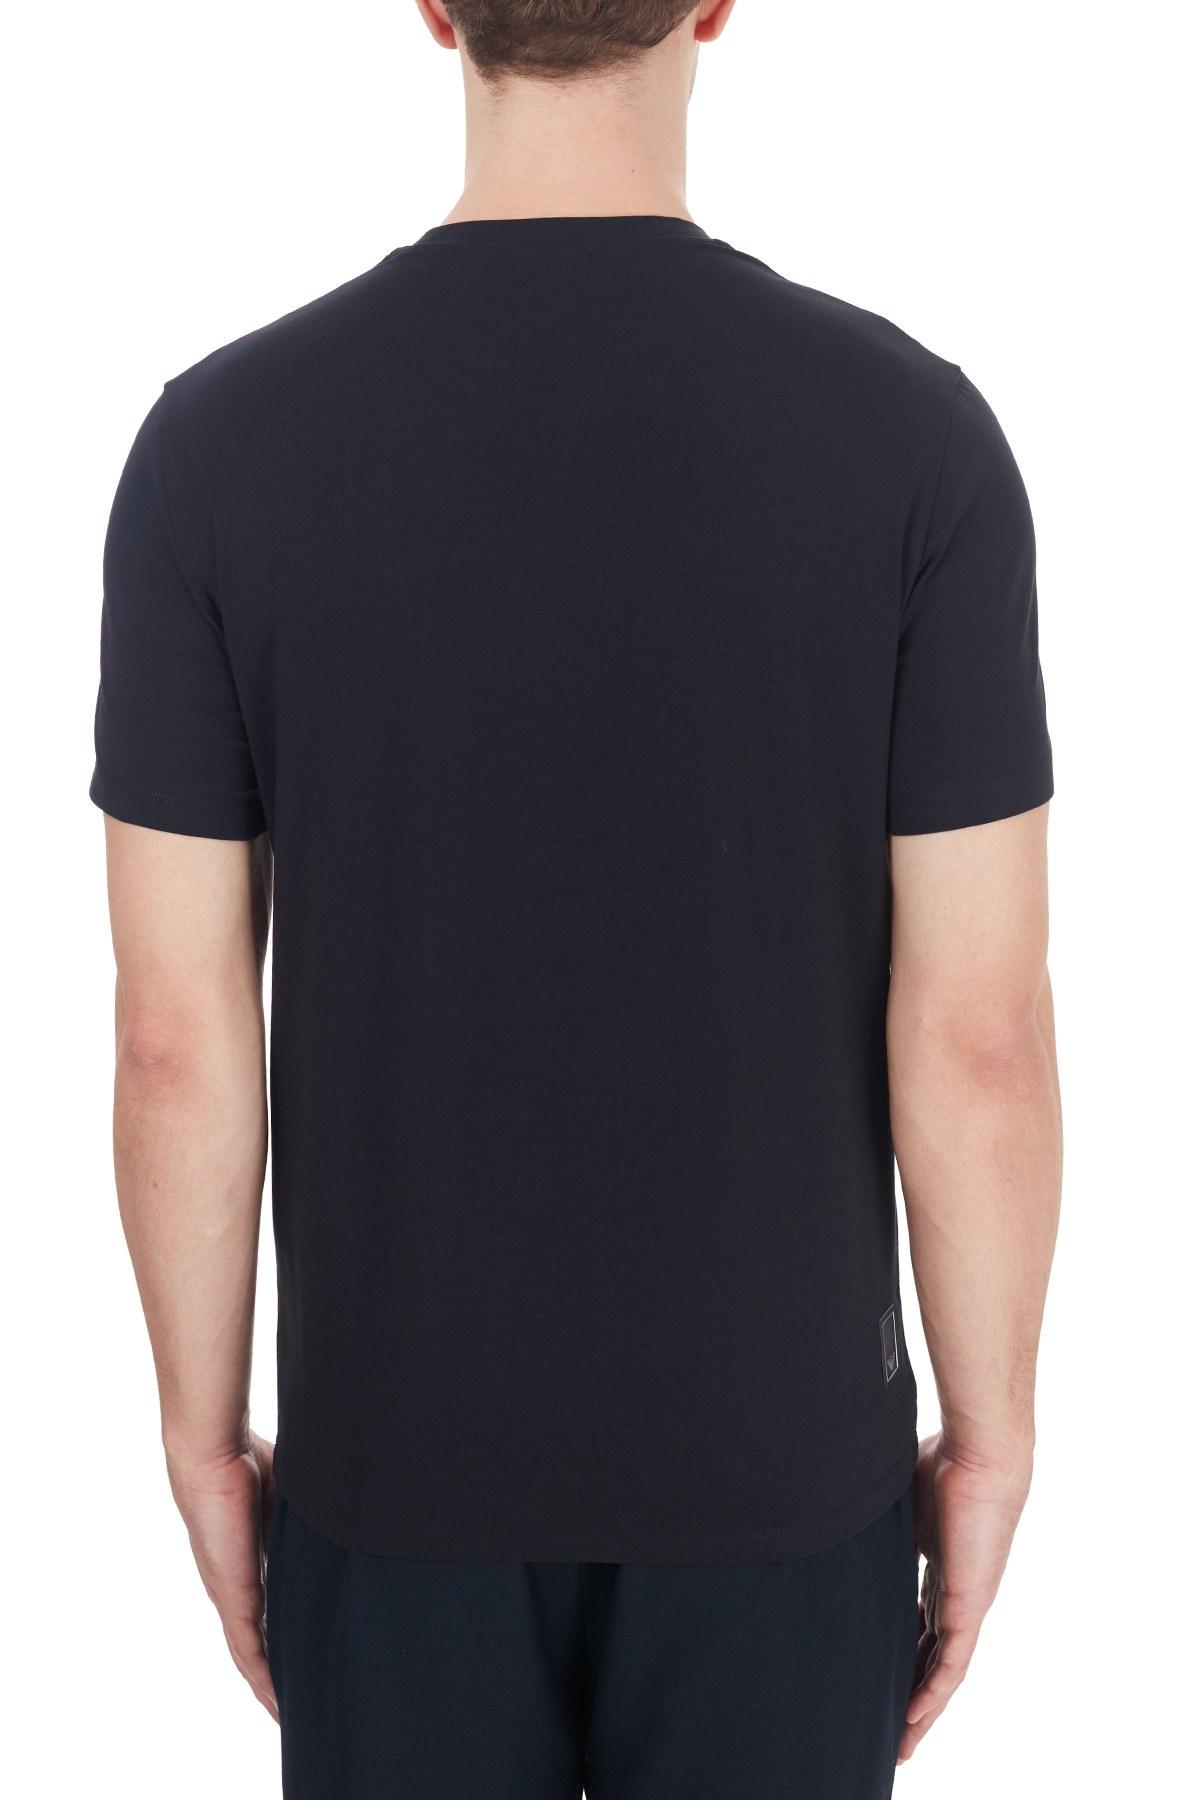 Emporio Armani Pamuklu Bisiklet Yaka Erkek T Shirt 6H1TS2 1JJRZ 0920 LACİVERT